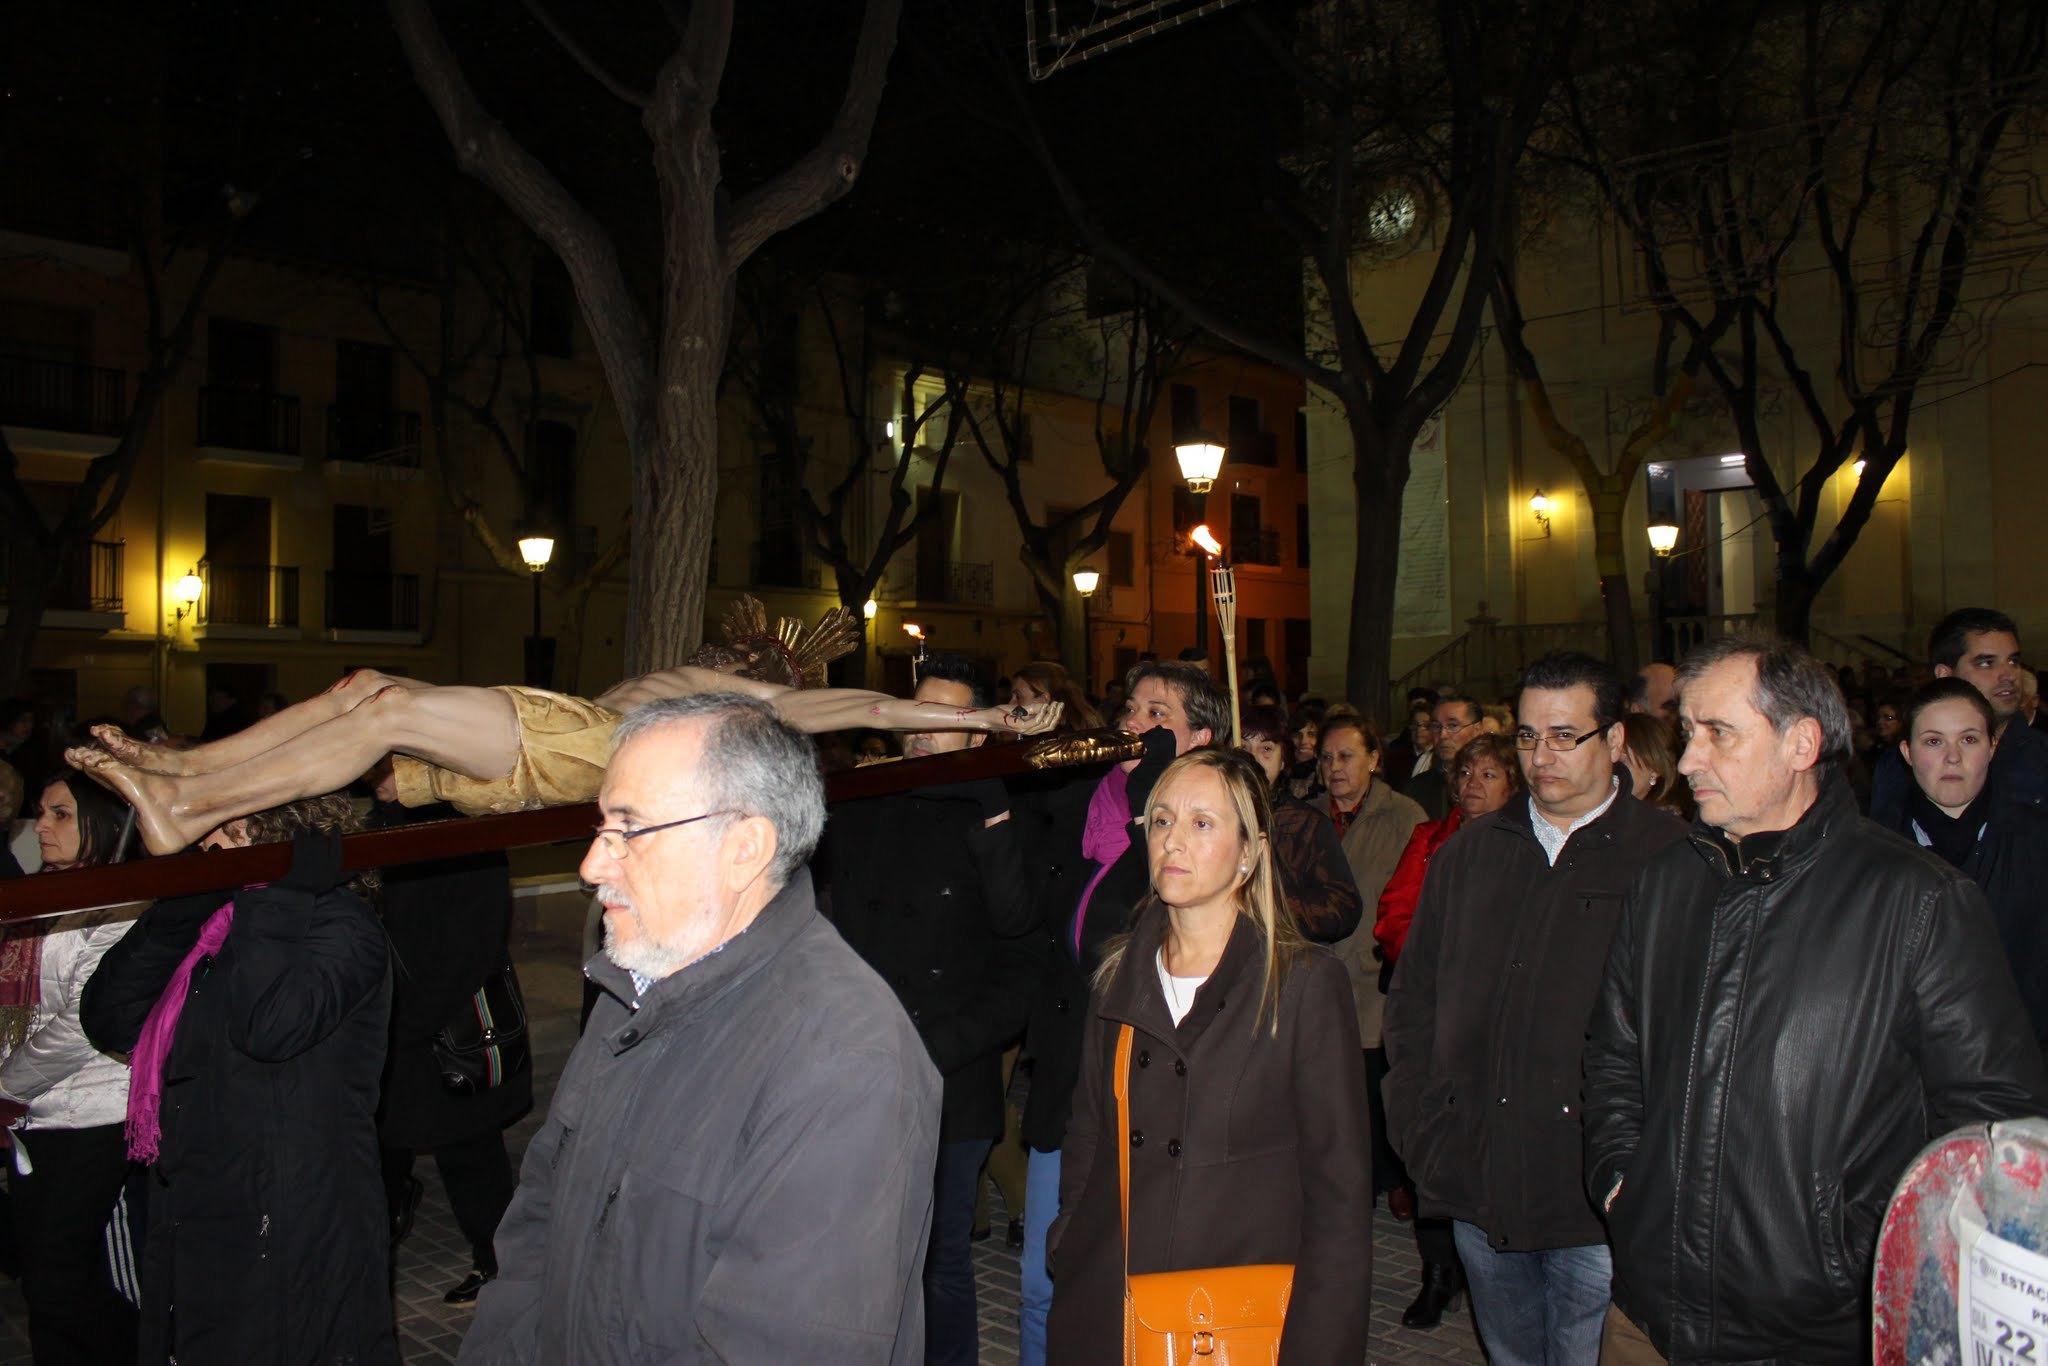 (2013-03-22) - IV Vía Crucis nocturno - Javier Romero Ripoll (129)